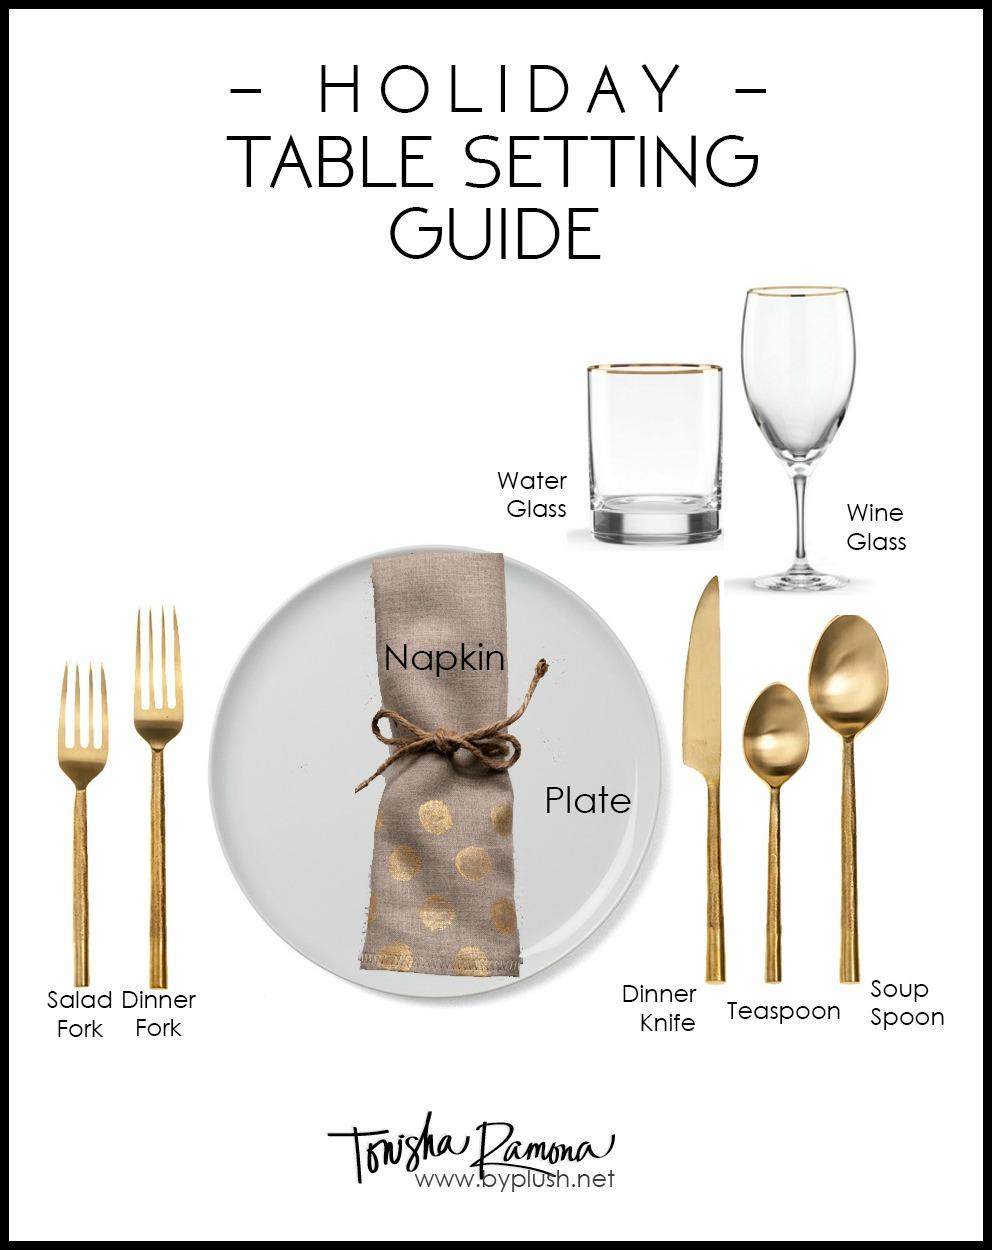 Tonisha Ramona: 5 UNIQUE HOLIDAY PLACE CARDS + TABLE SETTING GUIDE